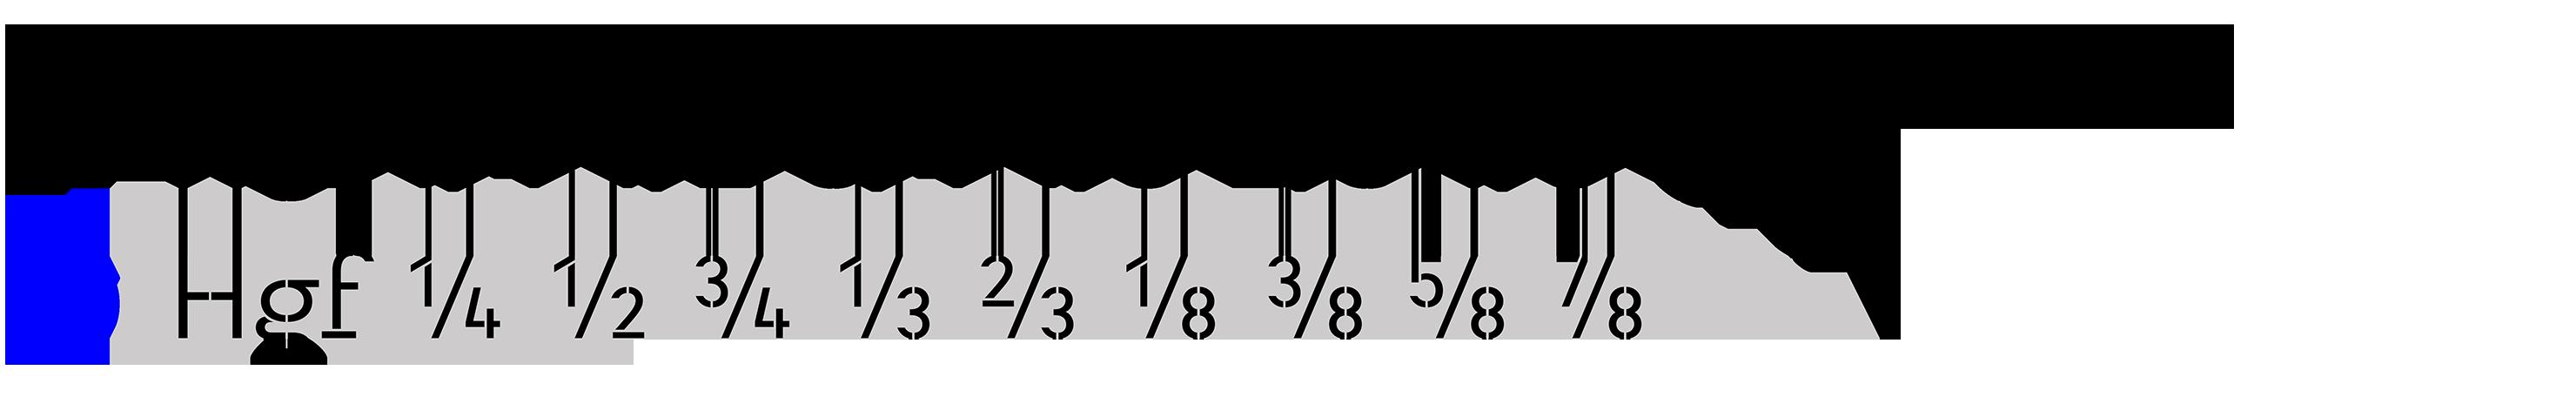 Typeface-Heimat-Stencil-F11-Atlas-Font-Foundry